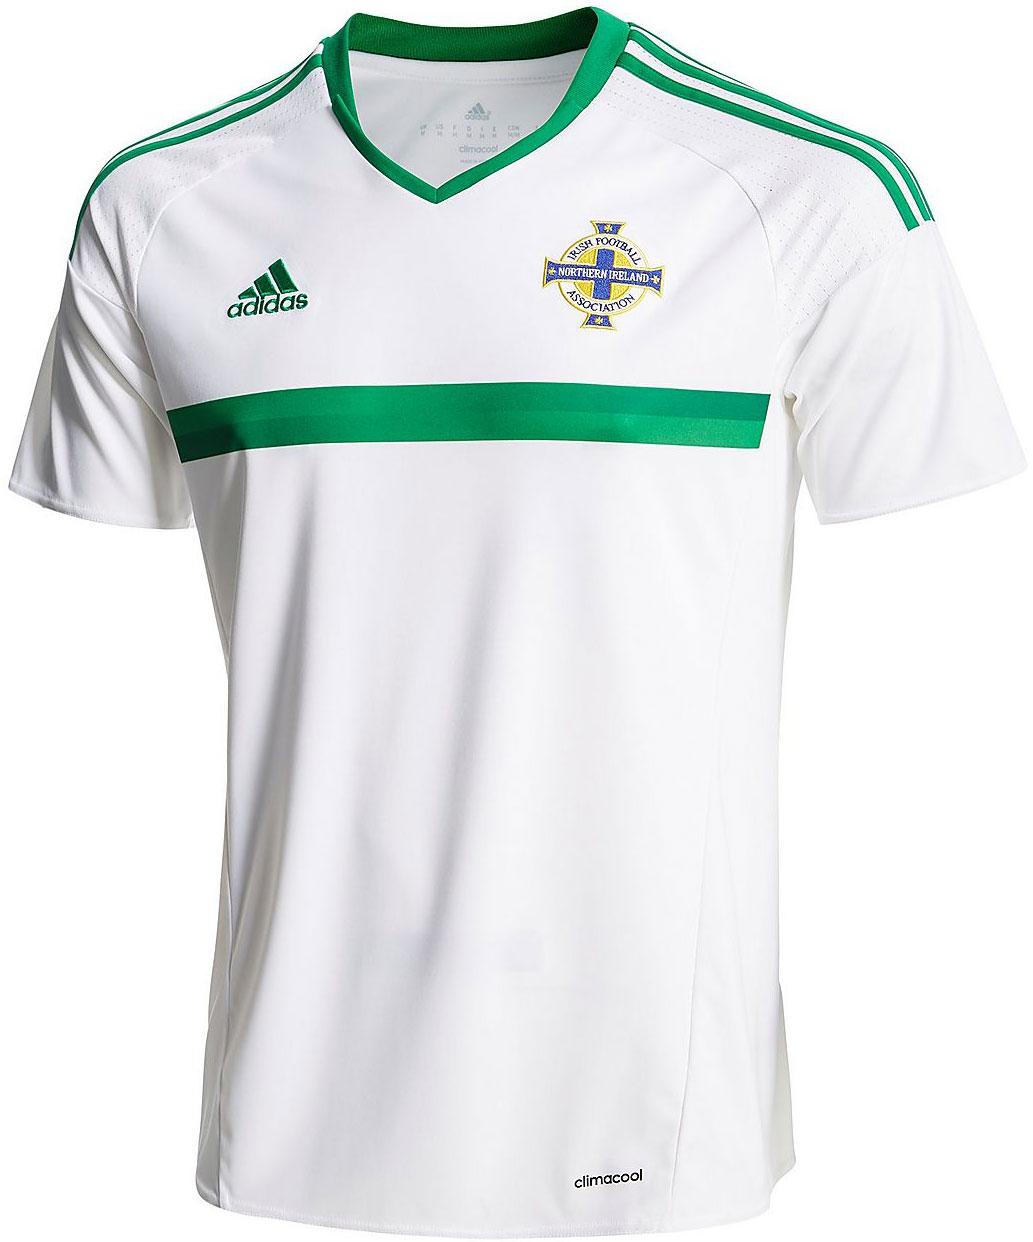 898cc3ed1a5 ... adidas-northern-ireland-euro-2016-away-kit